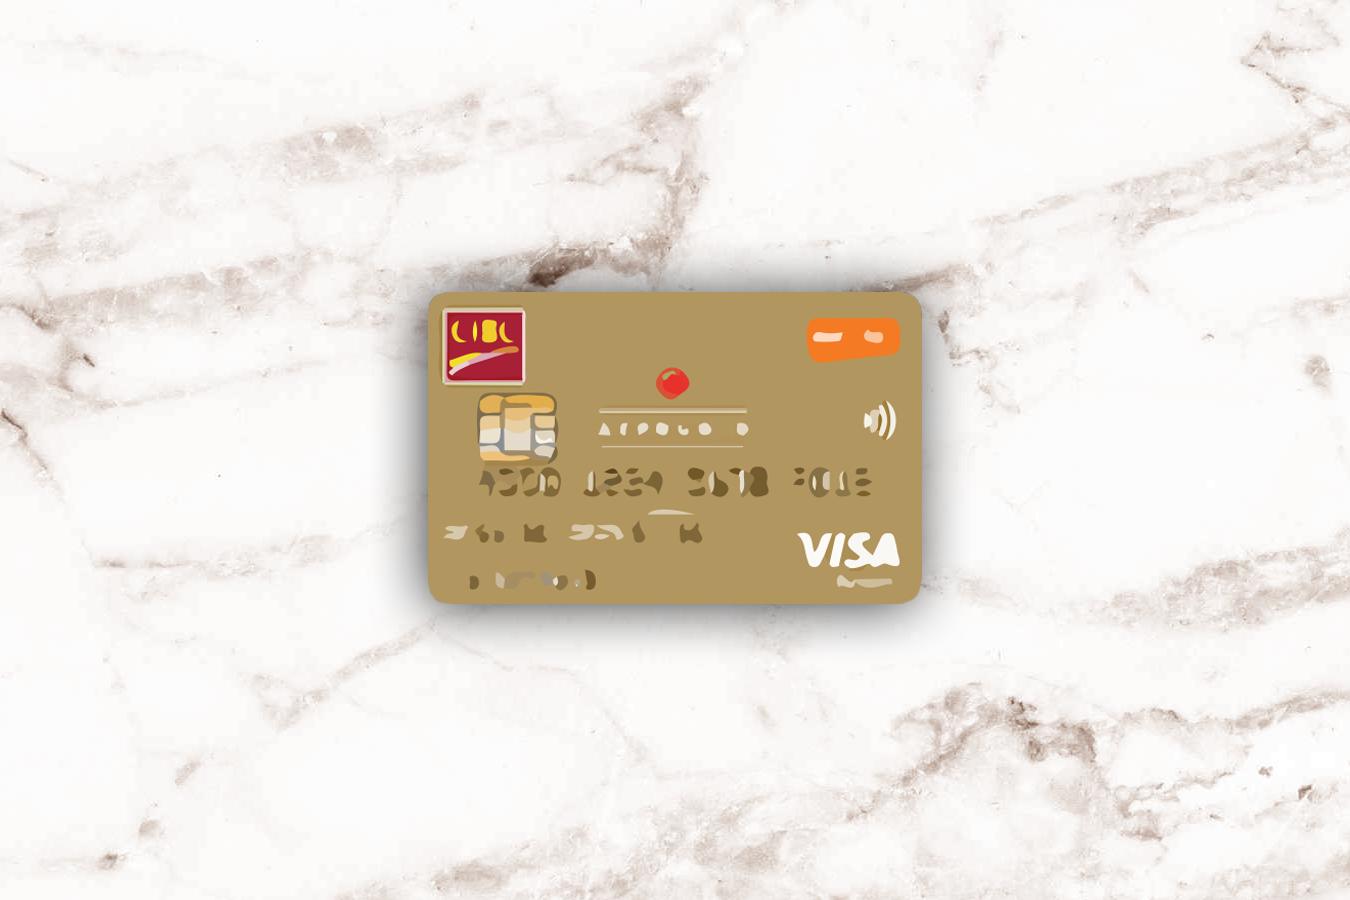 Cibc aerogold visa card for business credit card info prince of cibcaerogoldbizbannerg cibc aerogold visa card for business reheart Choice Image